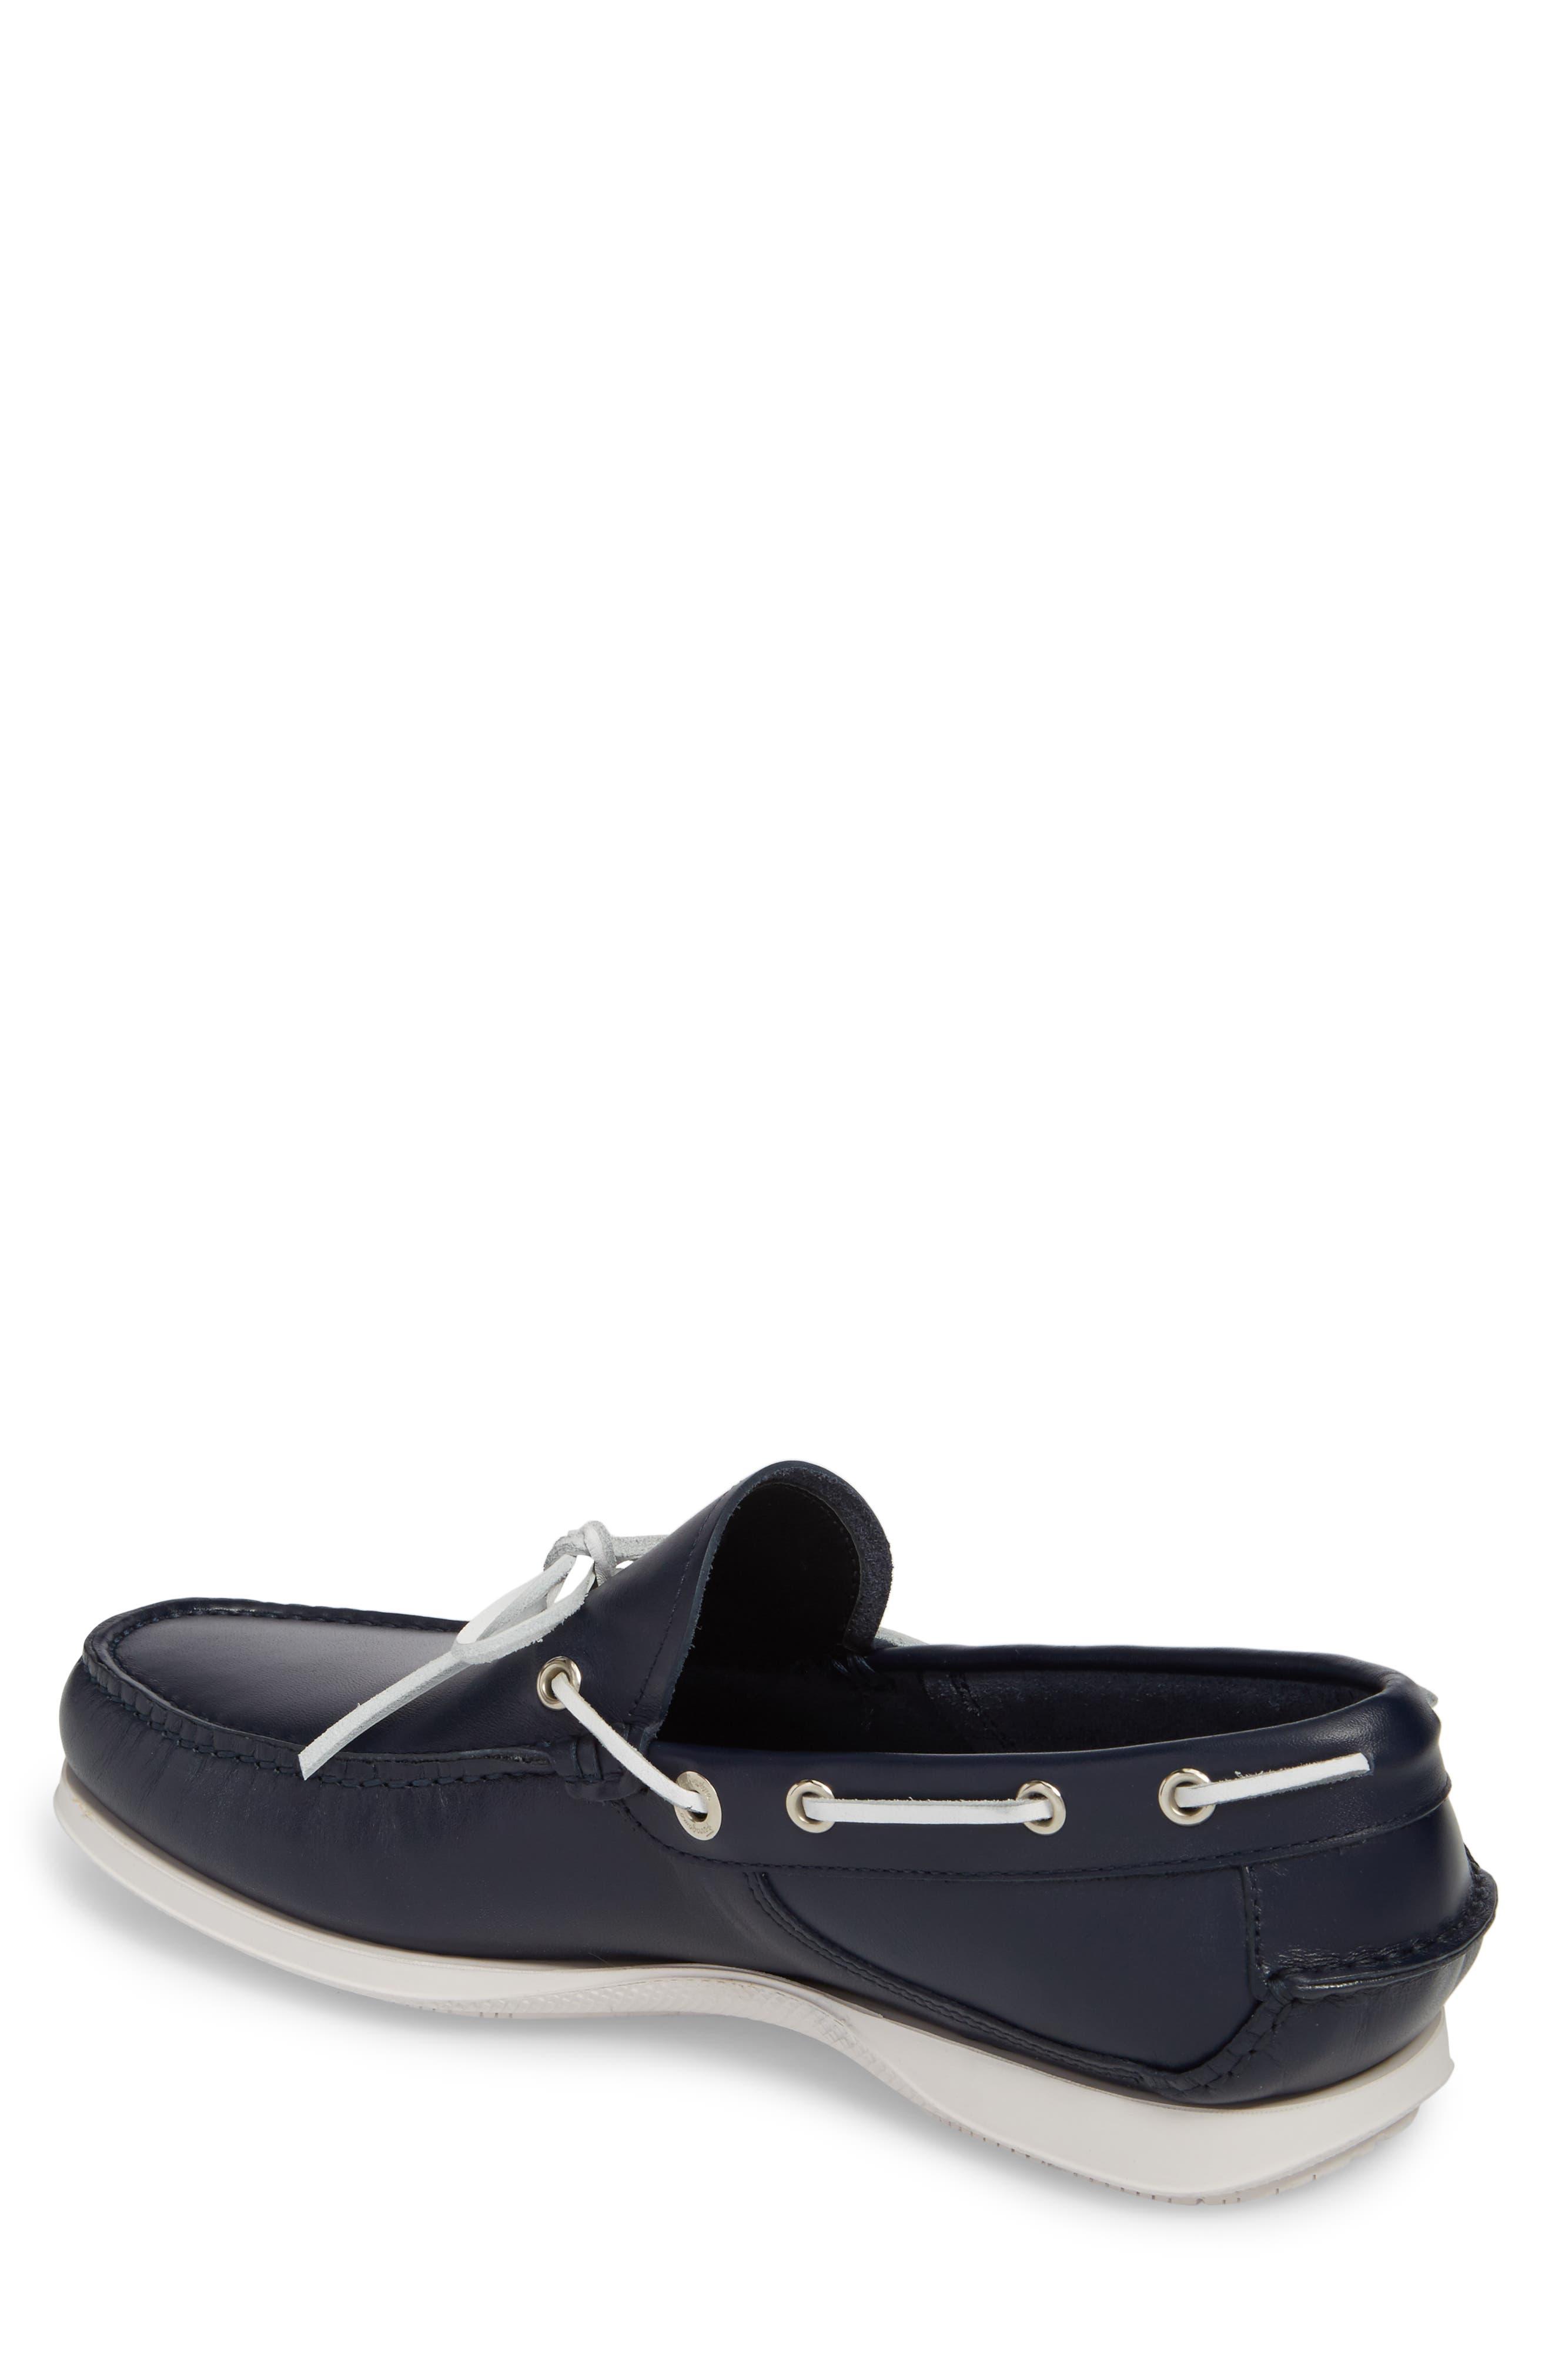 Caraibi Boat Shoe,                             Alternate thumbnail 2, color,                             Blue Marine